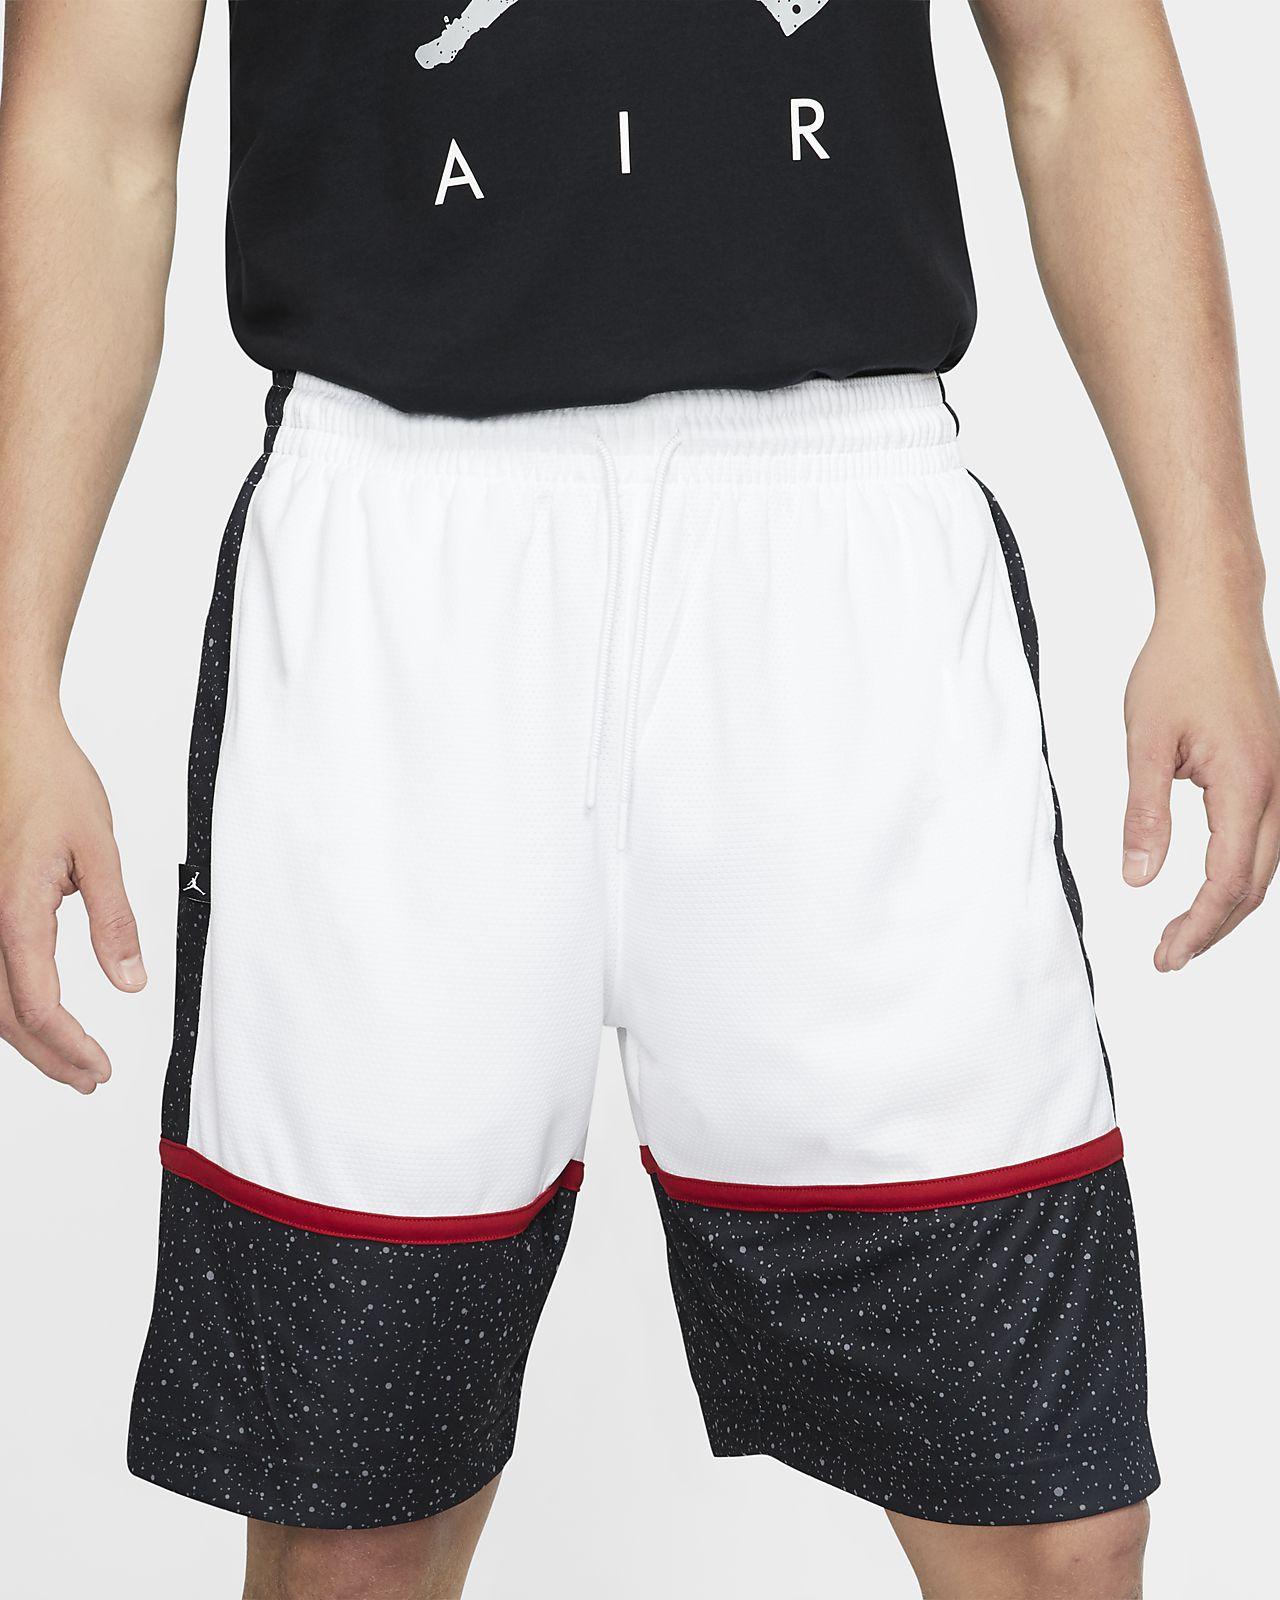 Shorts de básquetbol estampados para hombre Jordan Jumpman